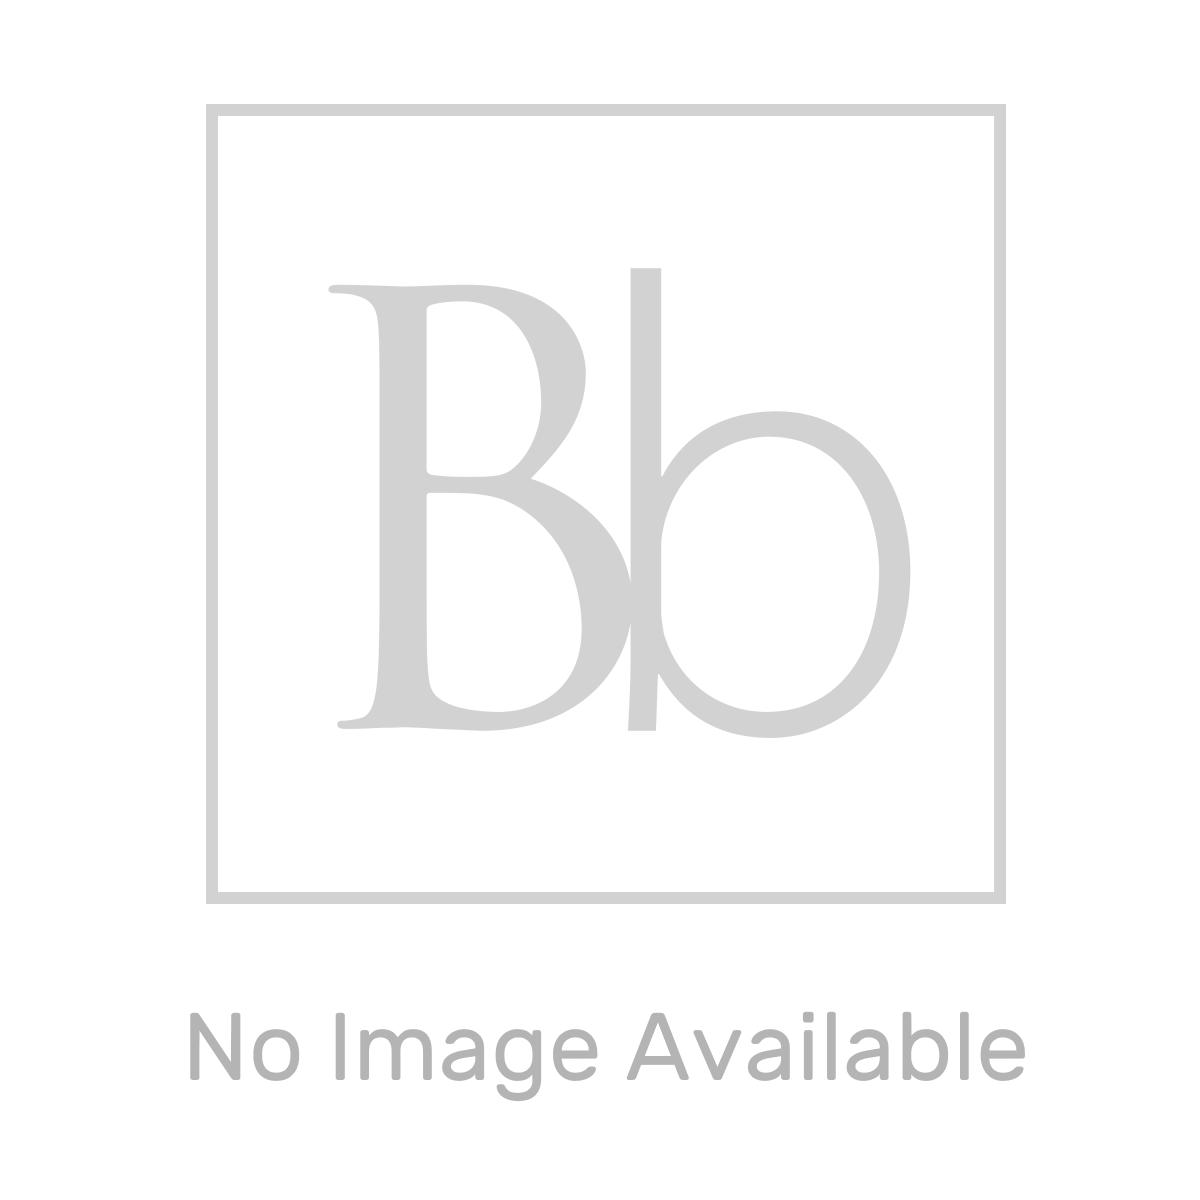 Aquadart Rectangular 1400 x 900 Shower Tray